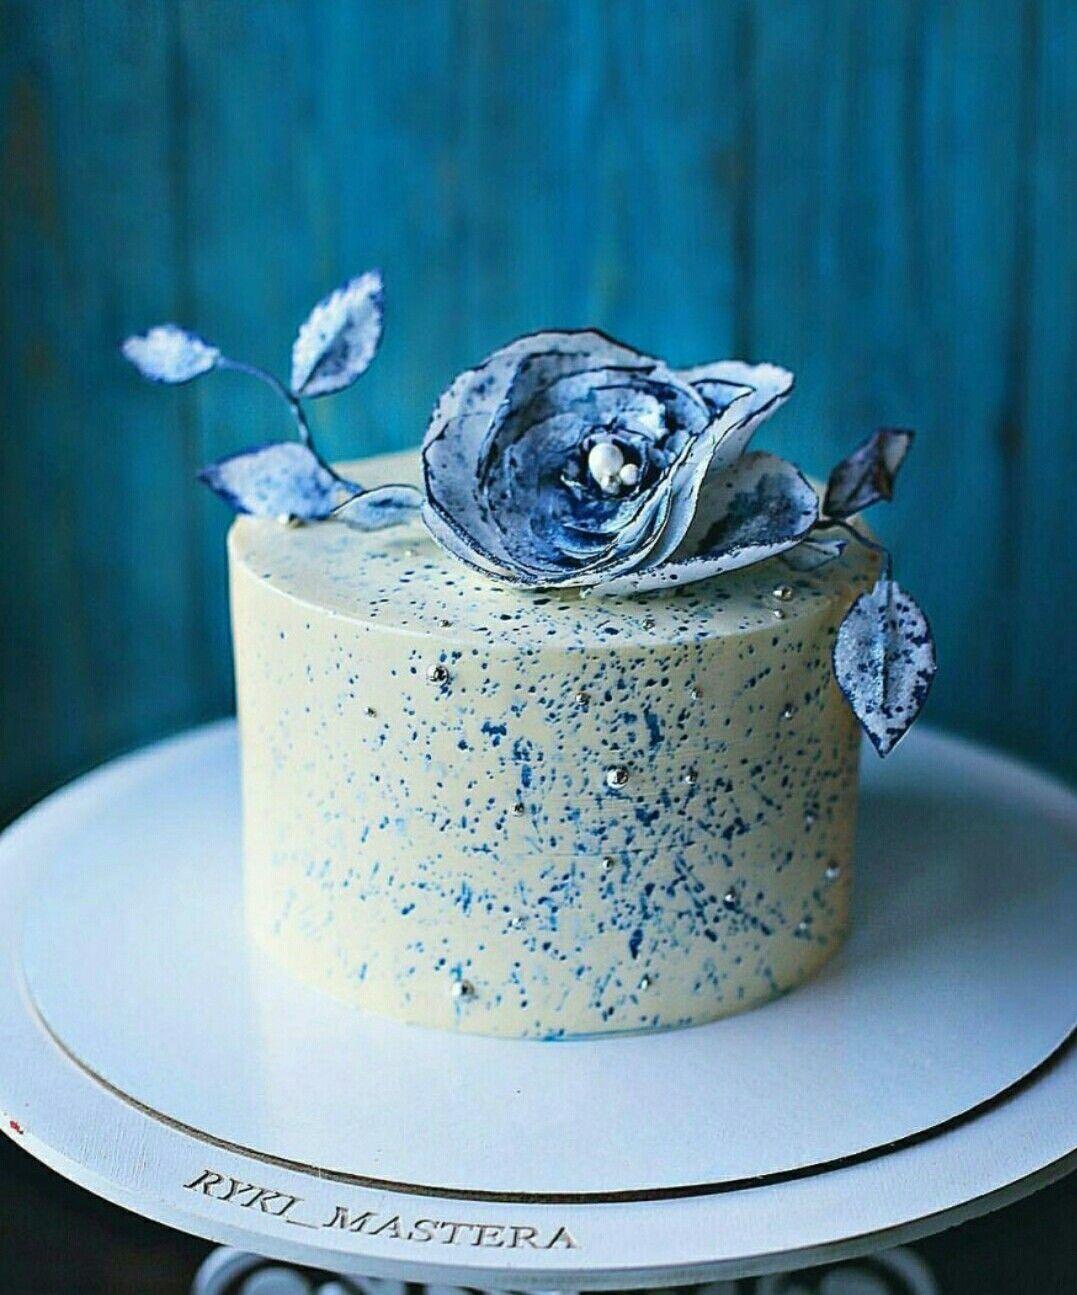 Lemon Elderflower Cake Copycat Royal Wedding Cake: Cake, Beautiful